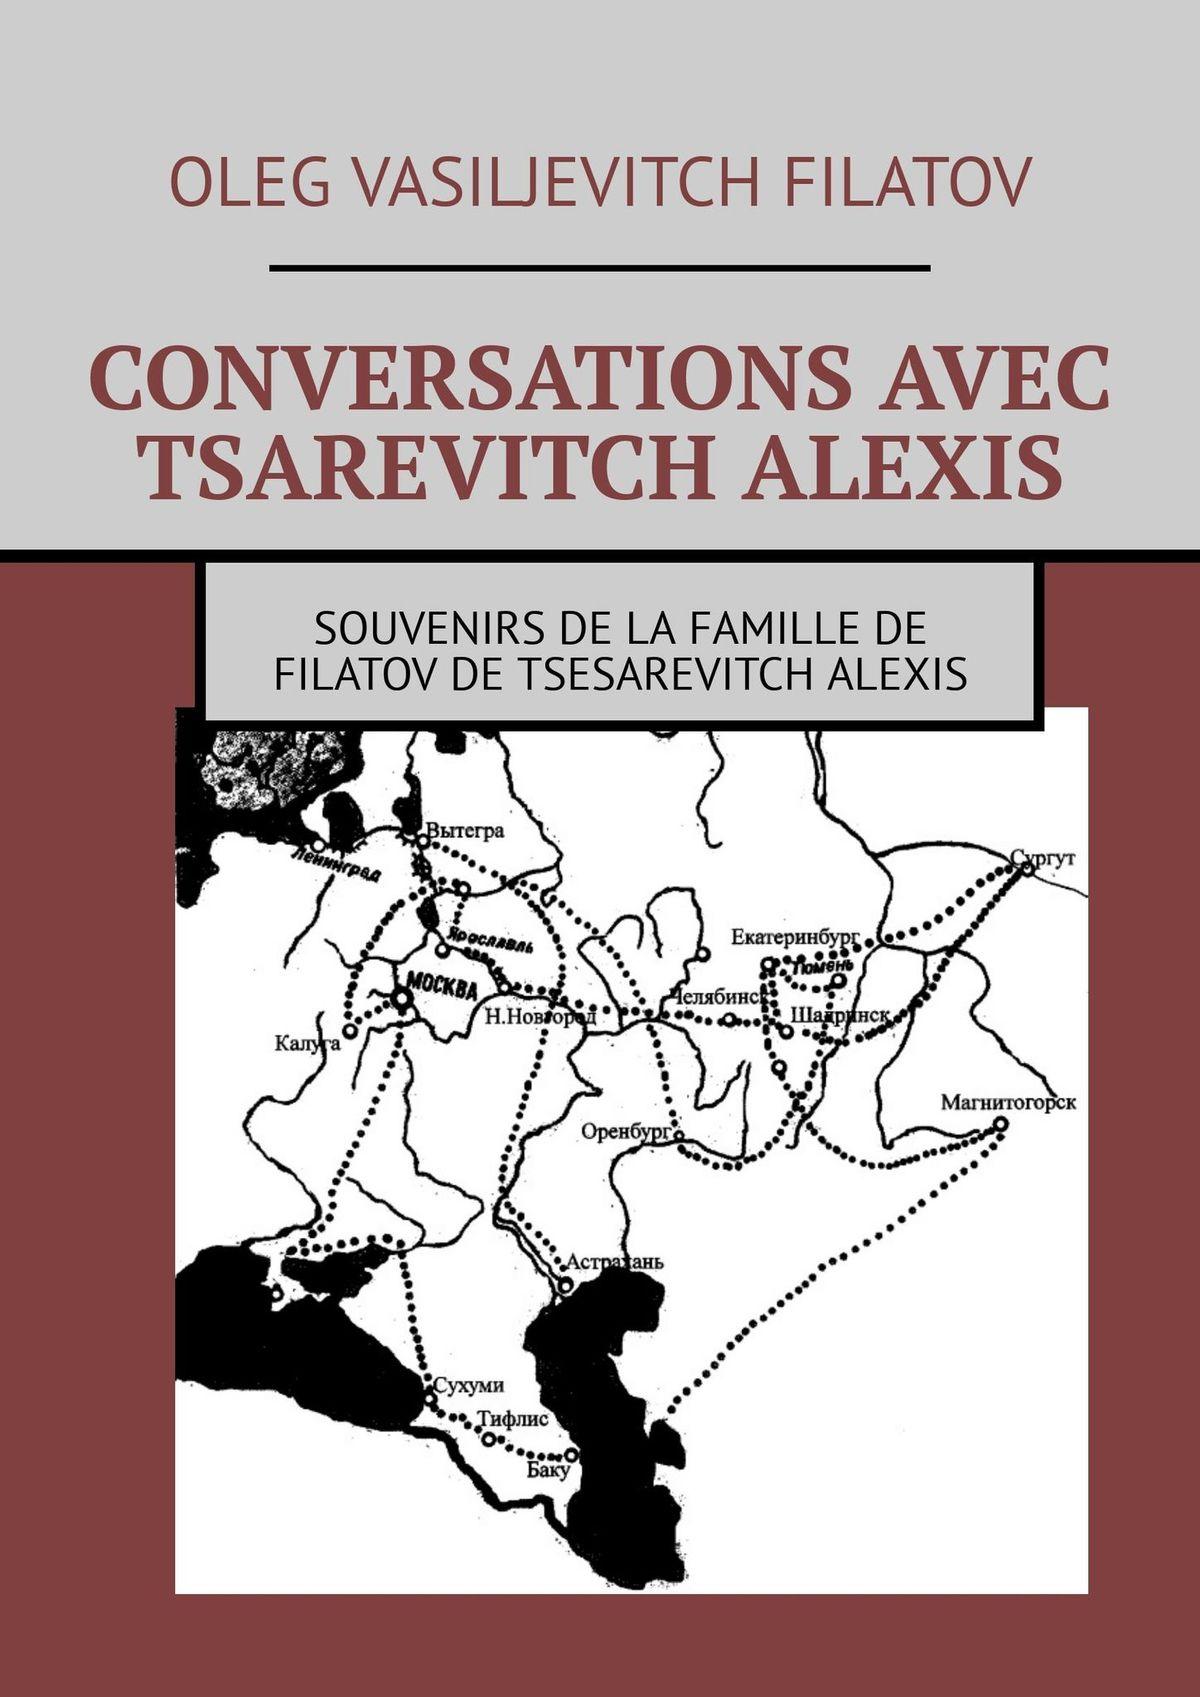 Oleg Vasiljevitch Filatov CONVERSATIONS AVEC TSAREVITCH ALEXIS. Souvenirs de la famille de Filatov de Tsesarevitch Alexis